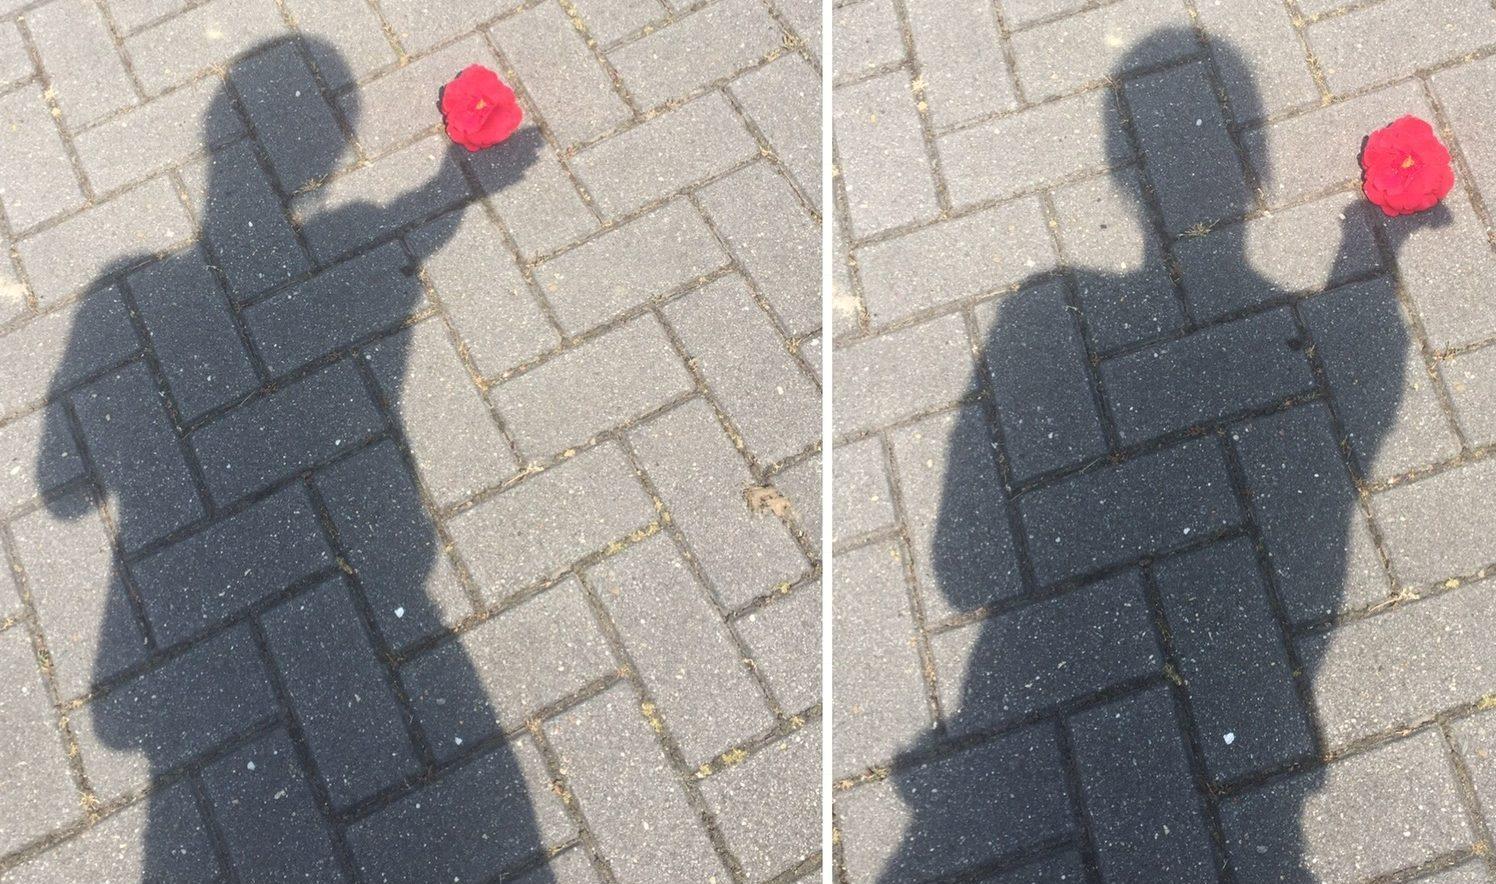 Schattenstory